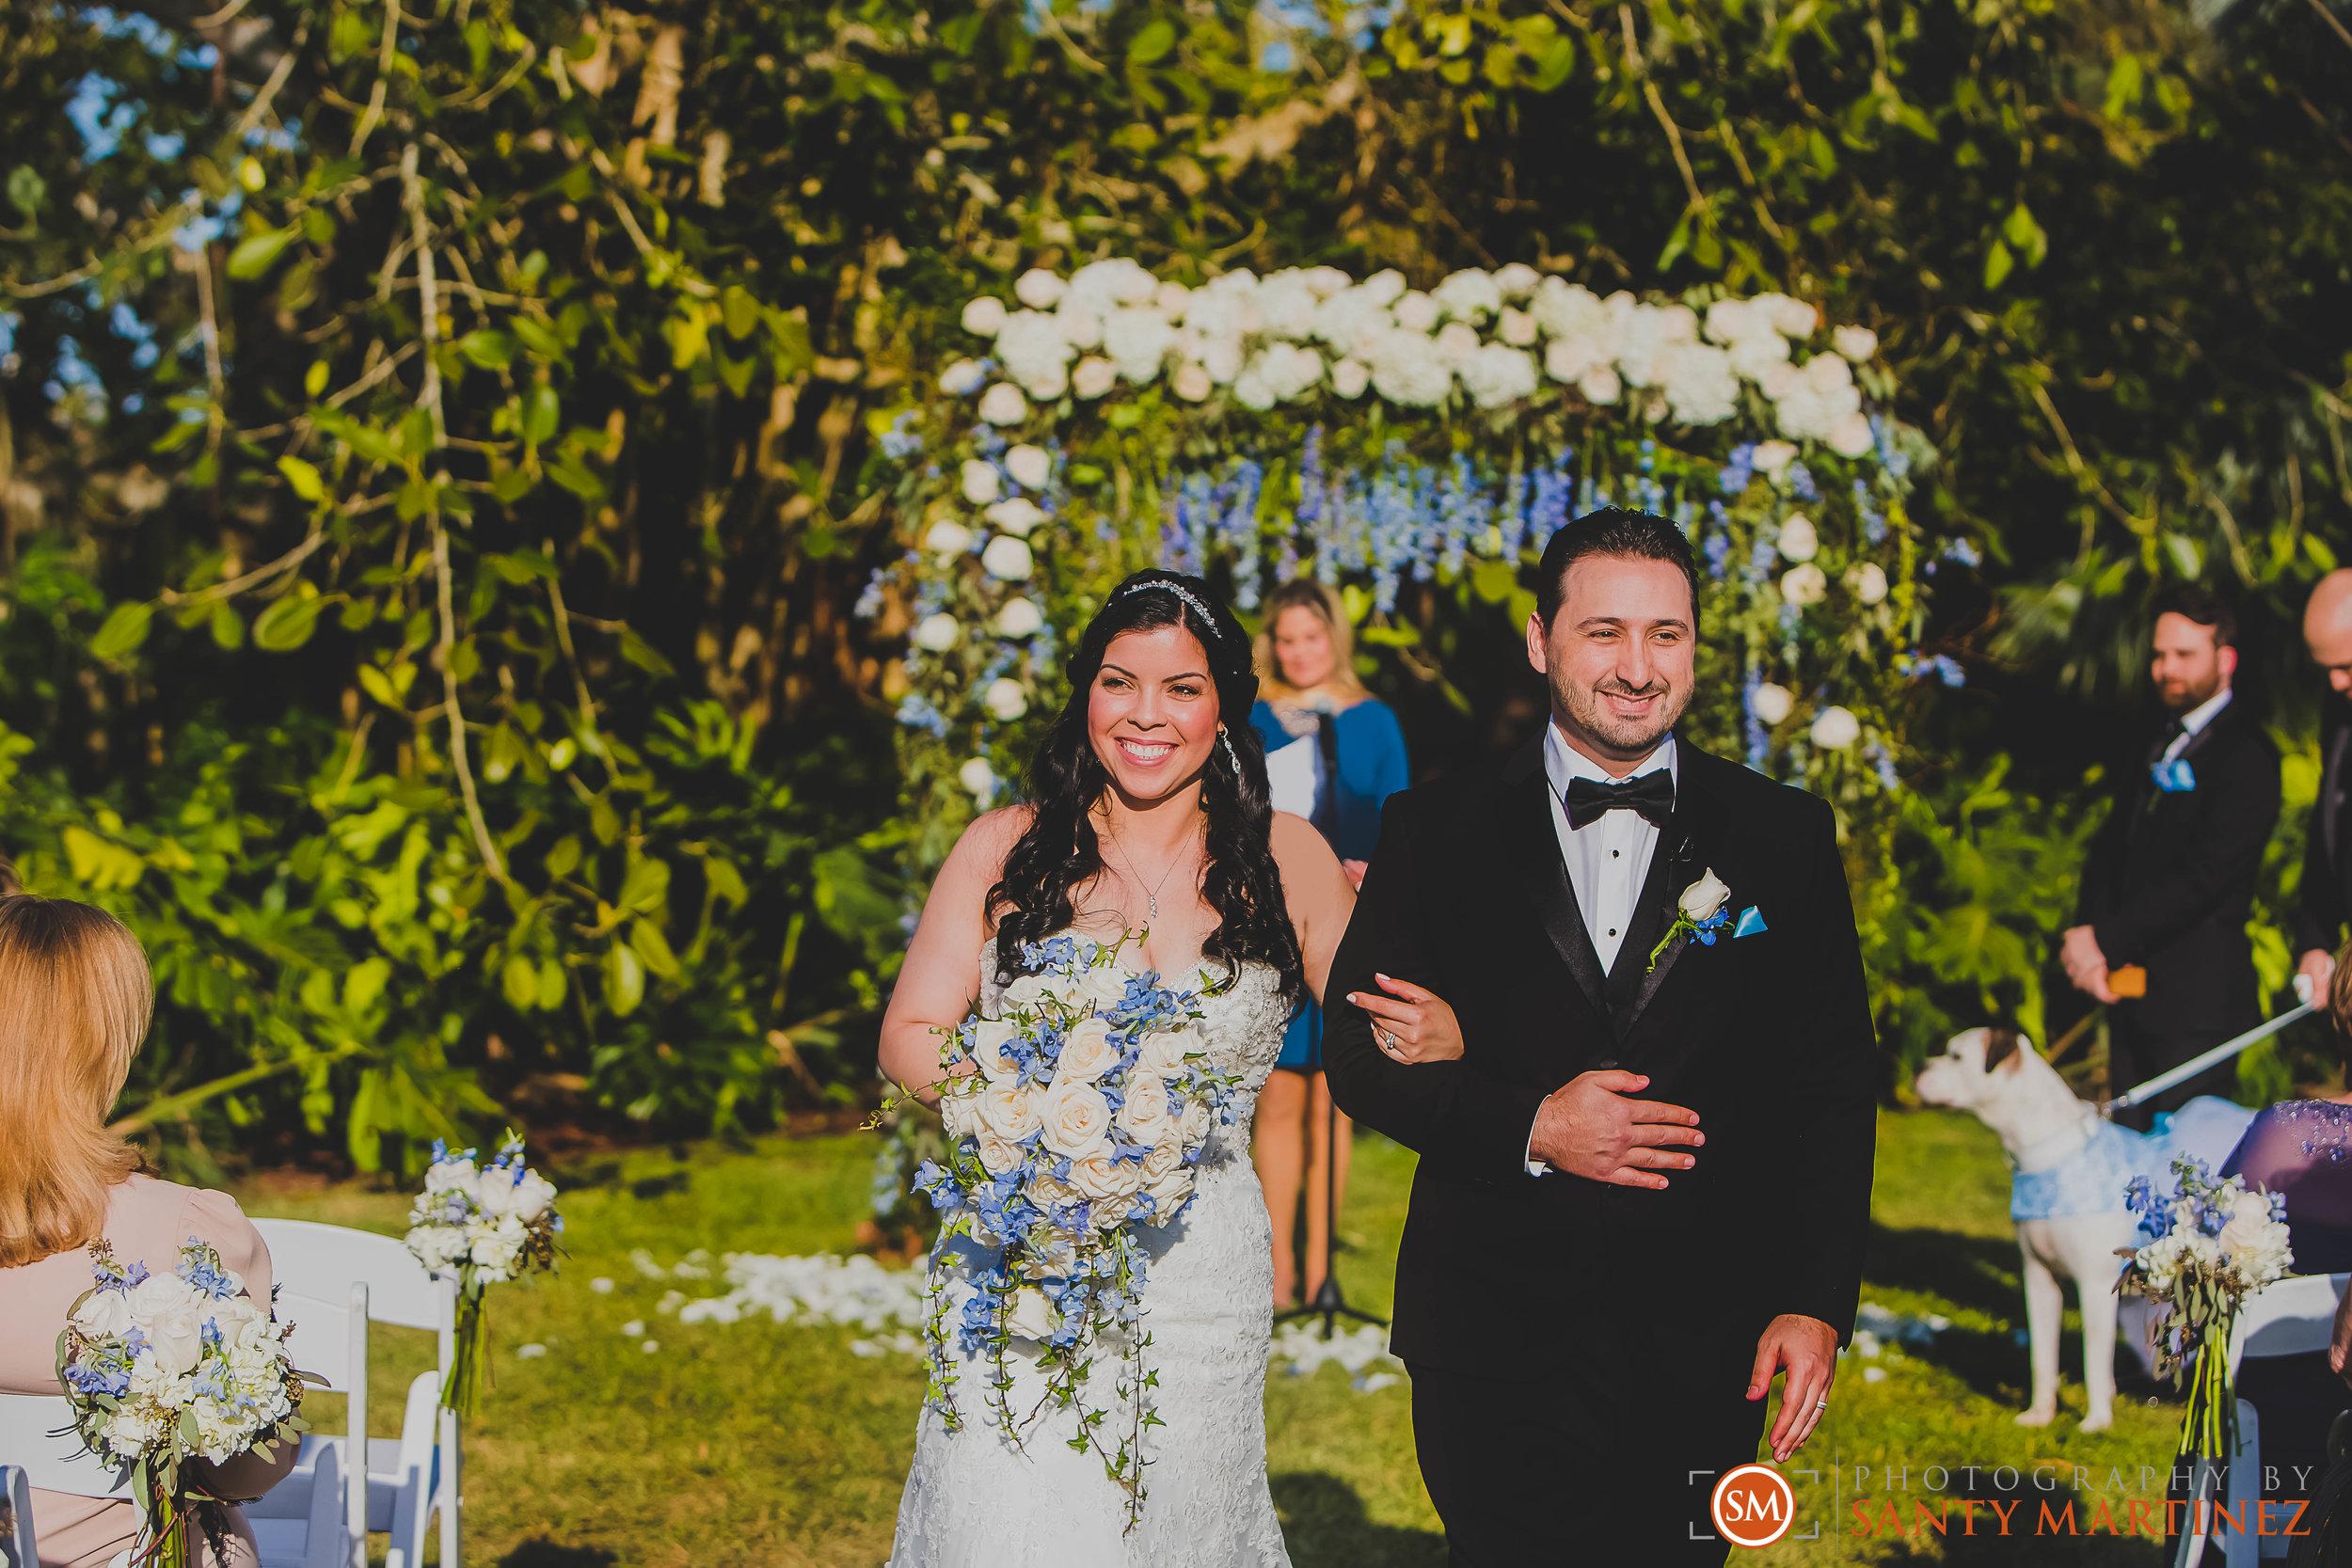 Wedding - Whimsical key West House - Photography by Santy Martinez-21.jpg